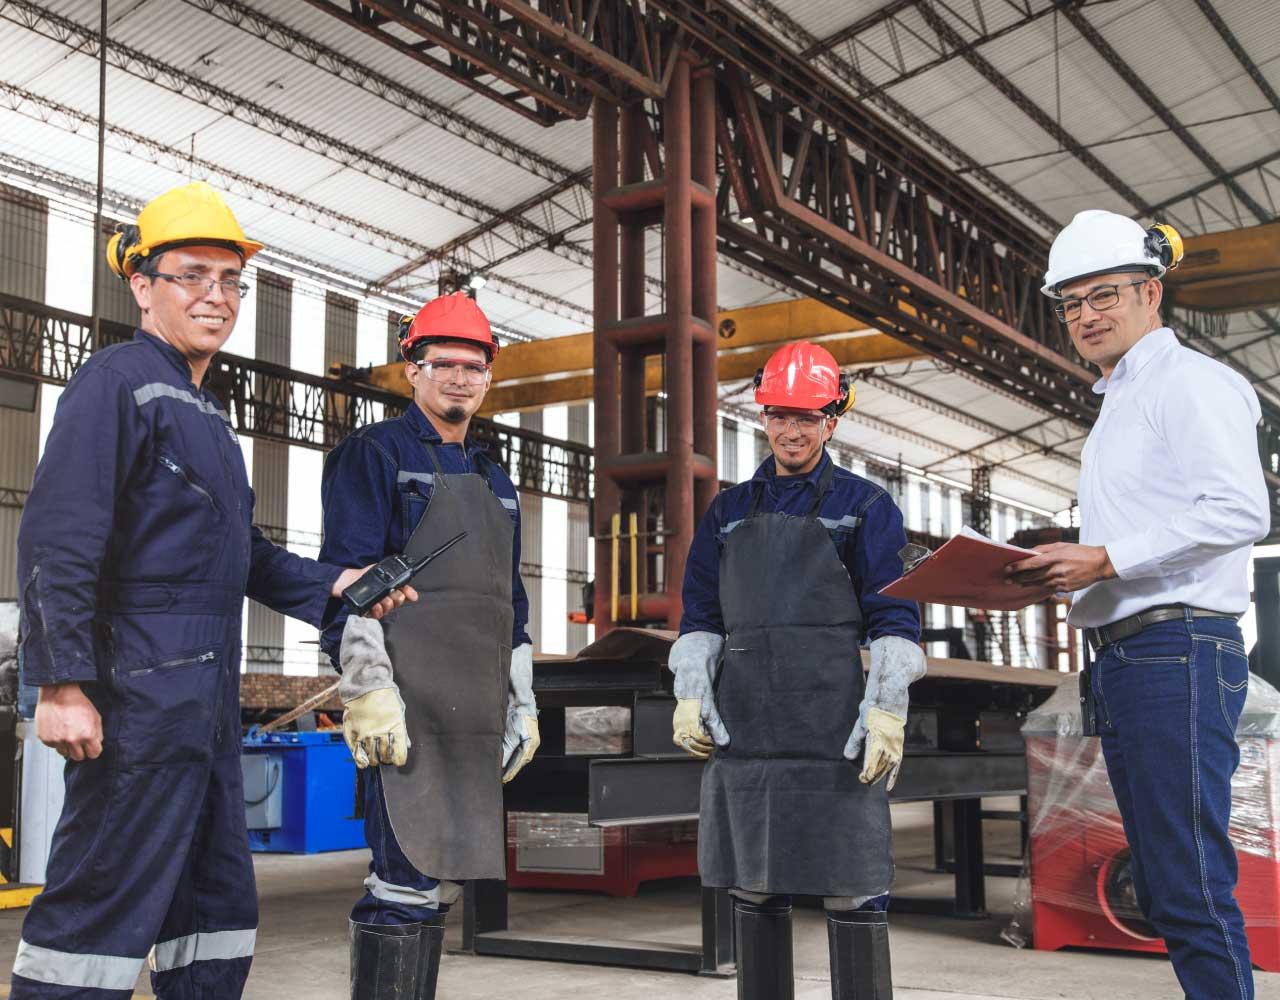 grupo-siderurgico-reyna-nosotros